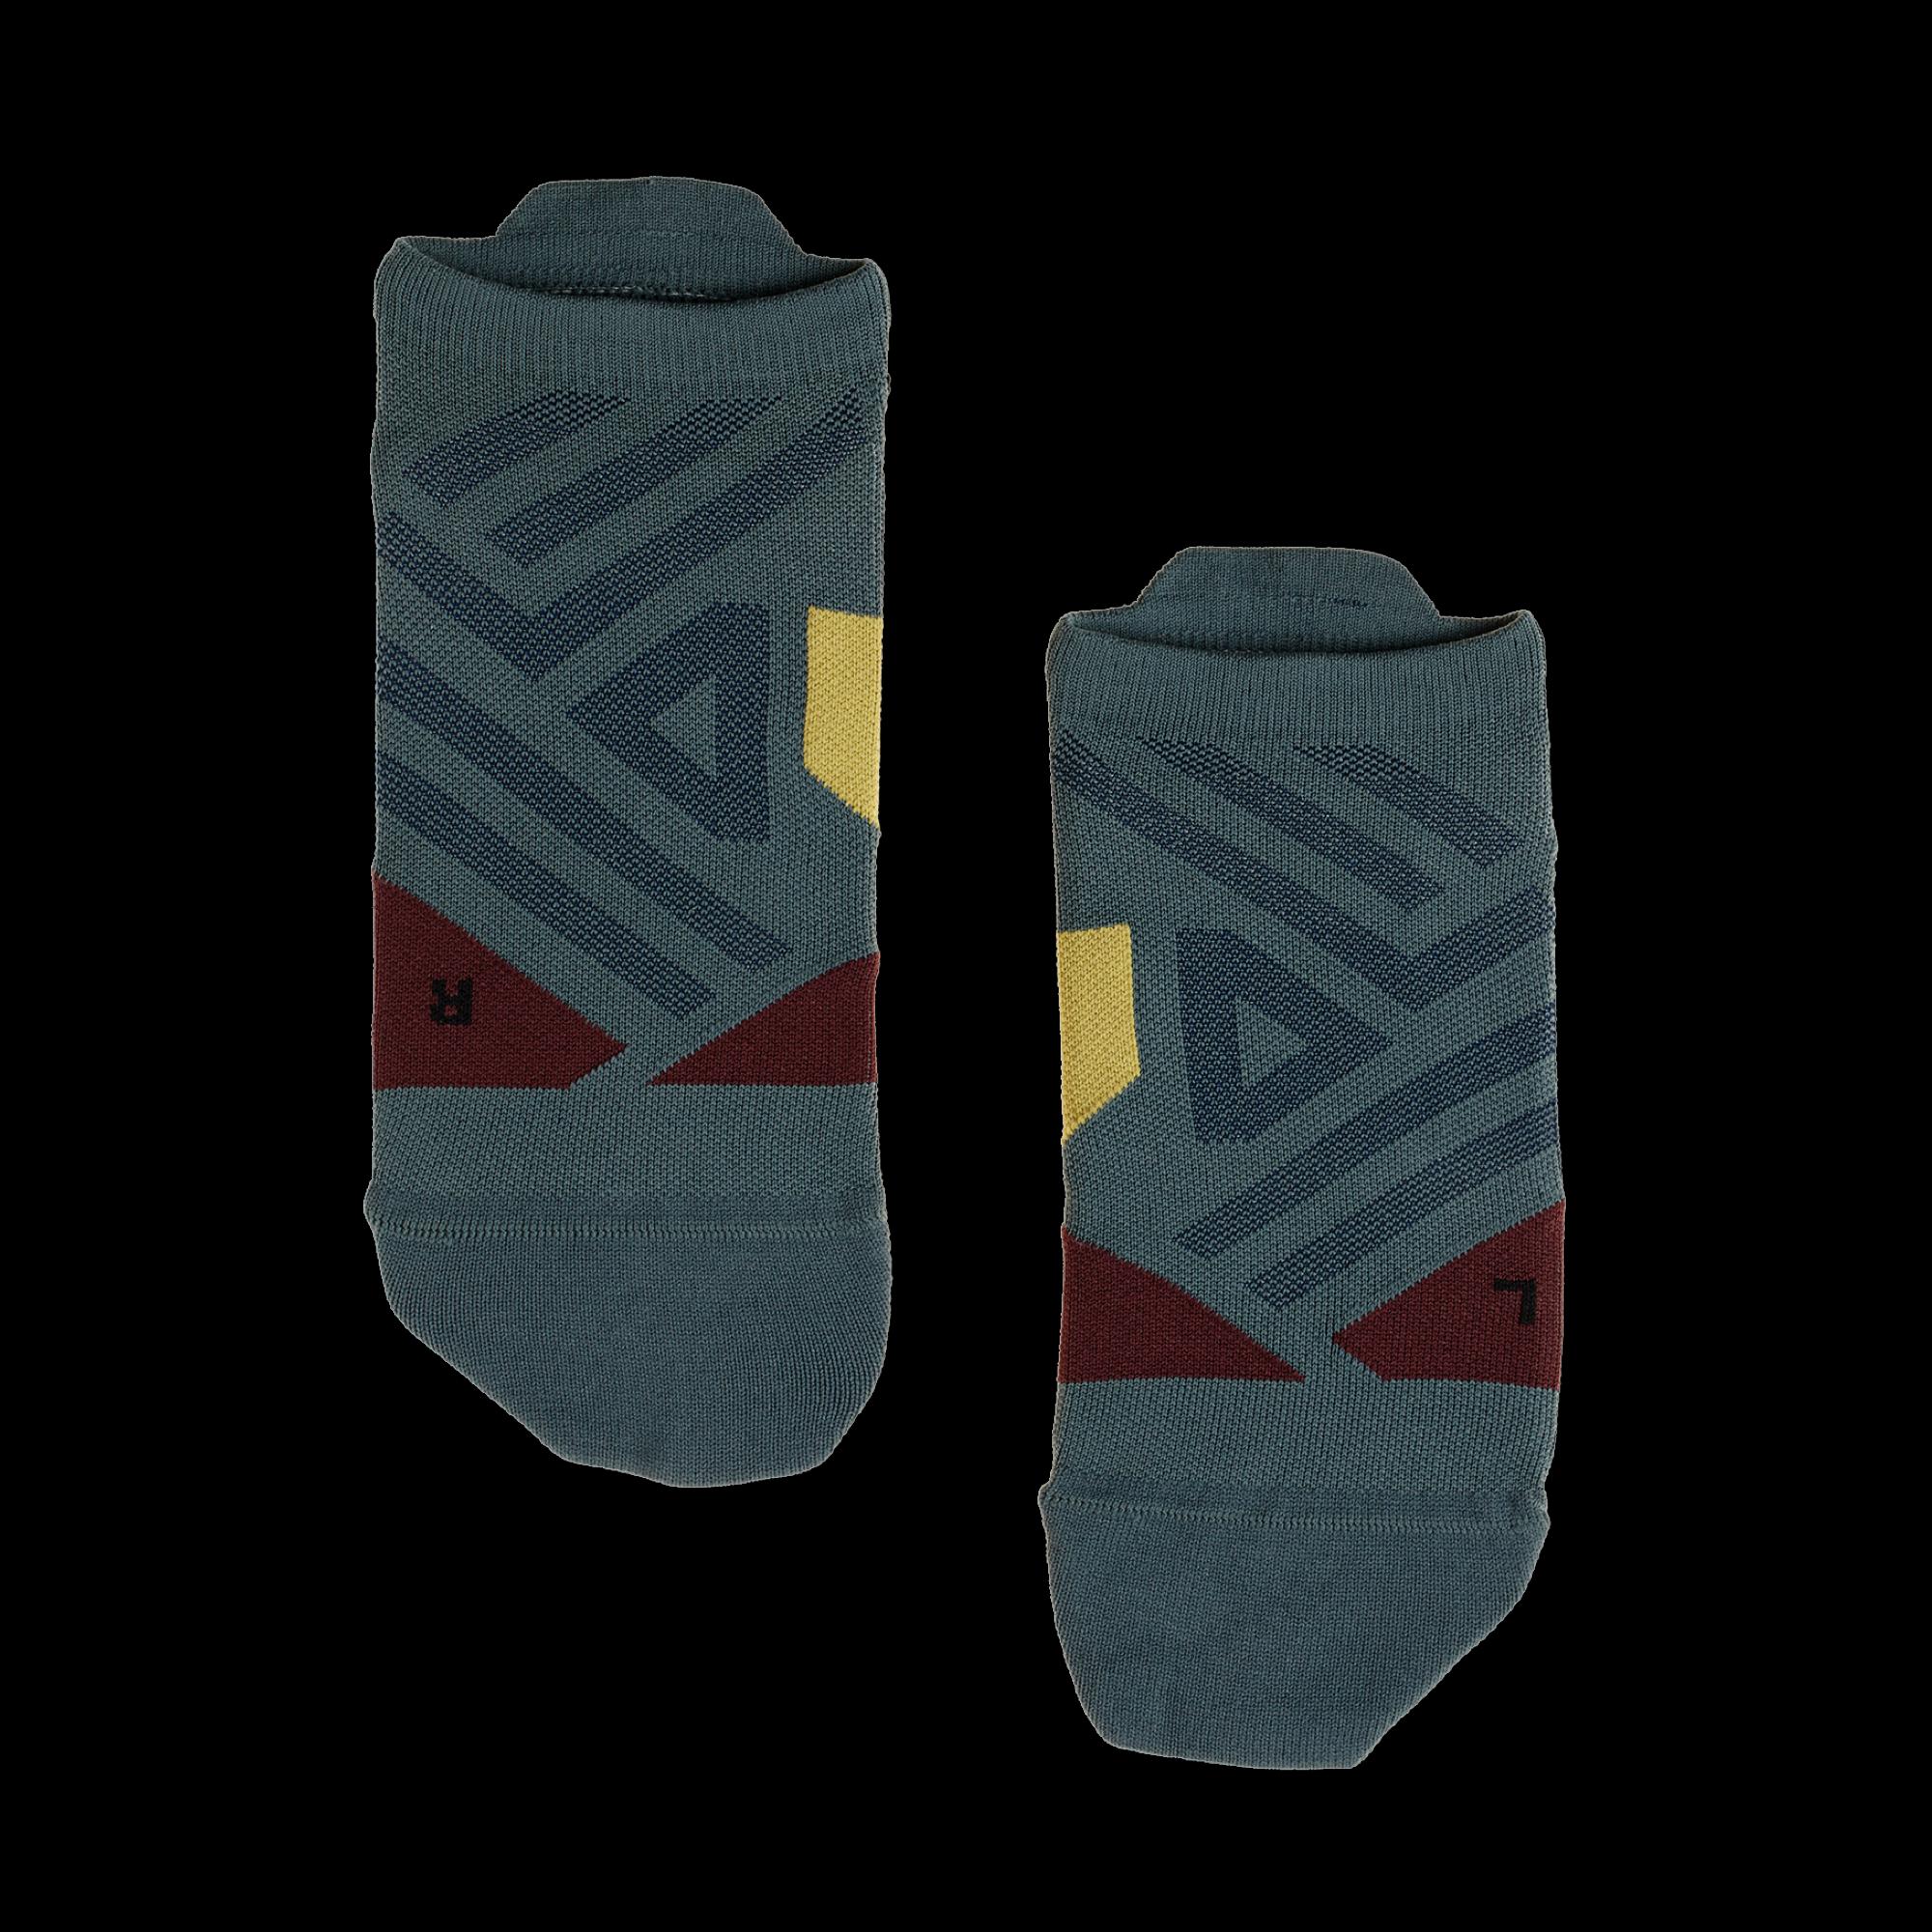 Low Sock - Low Running socks   On